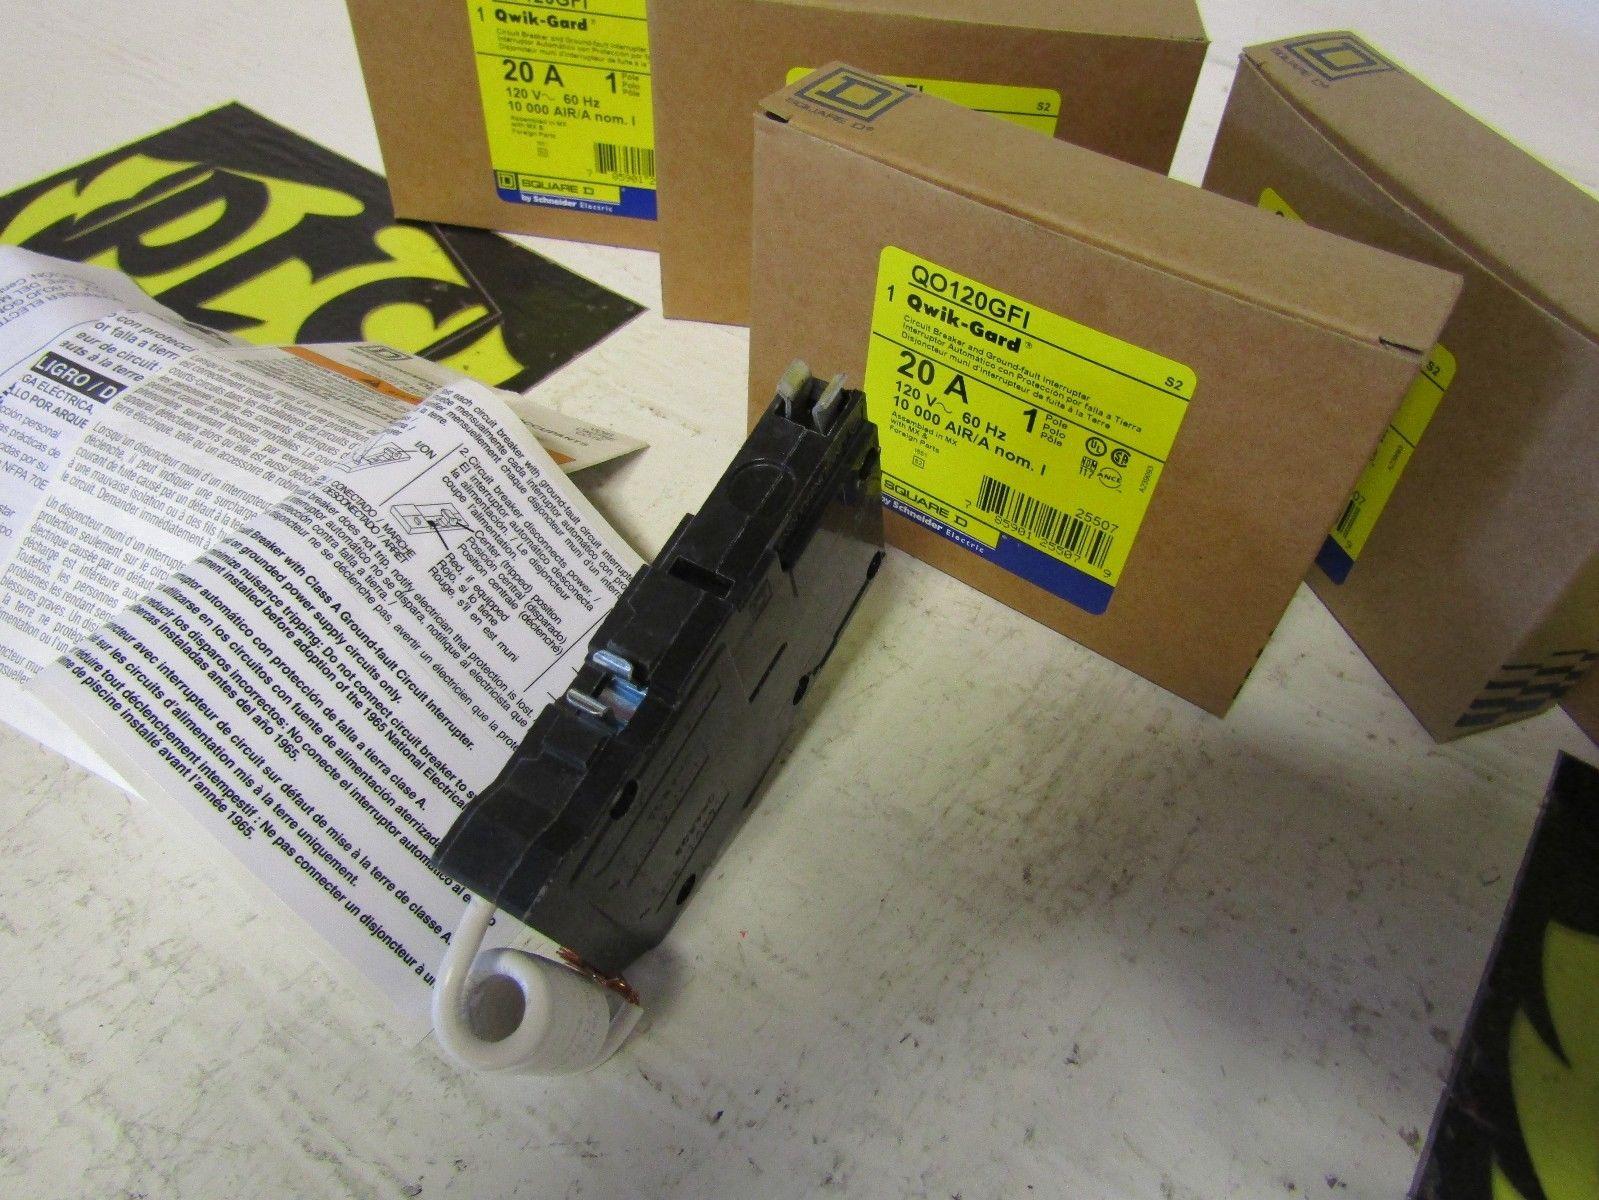 Qo120gfi Plug In Gfi Gfci Circuit Breaker 20a 1 Pole 10ka 120v